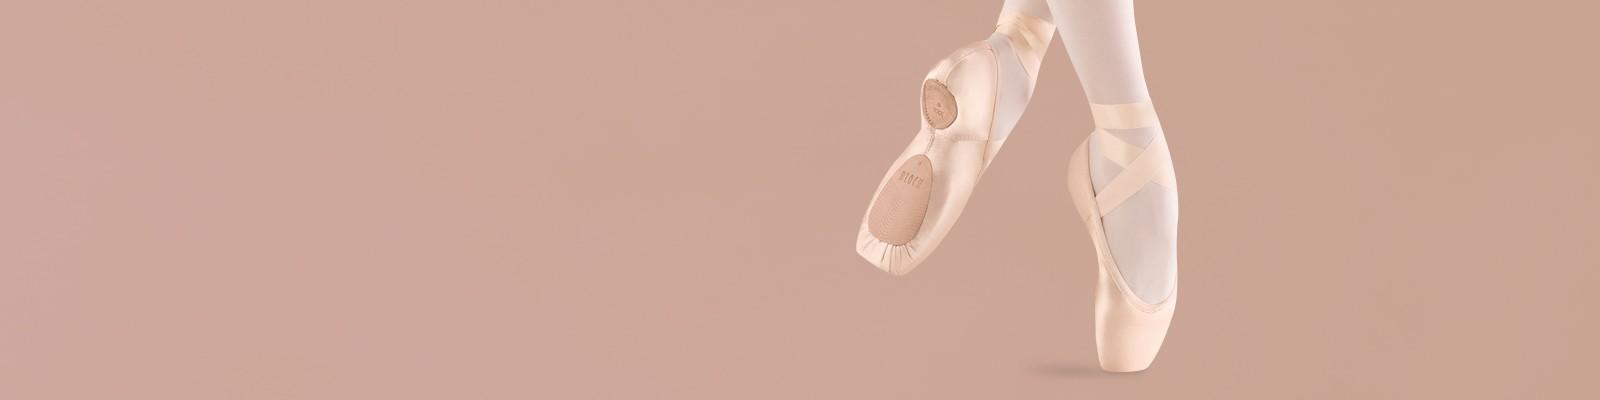 ballet-pointe-shoes-1-120.jpg